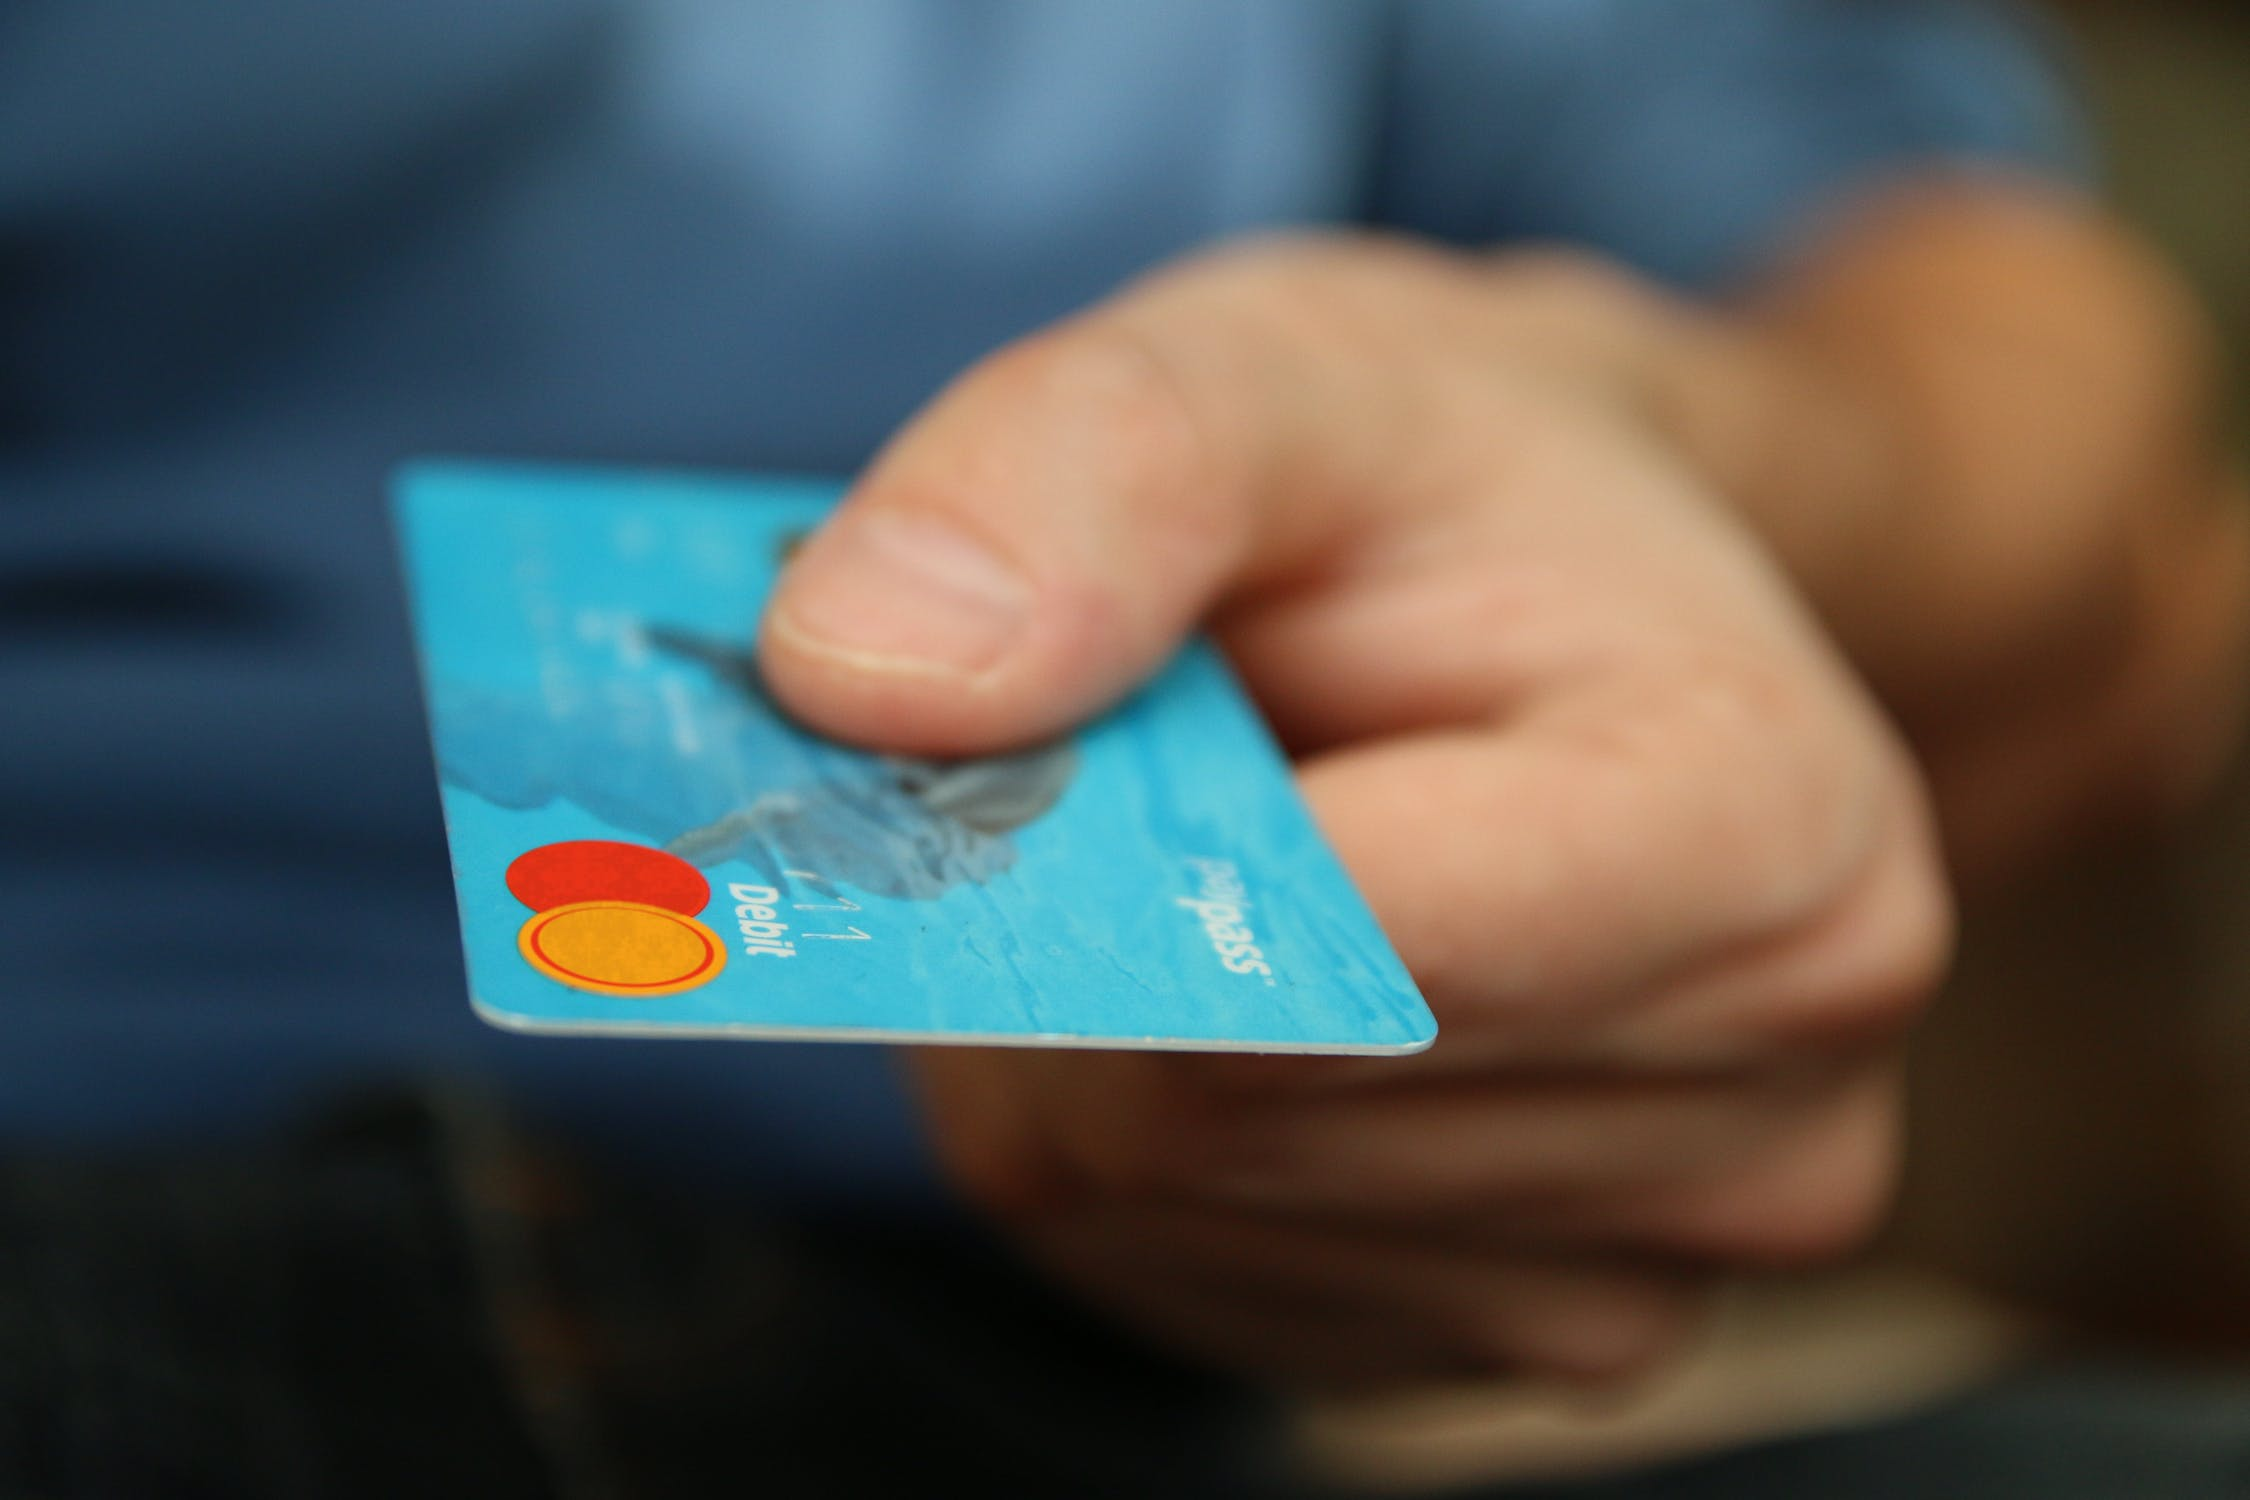 online lån trods rki